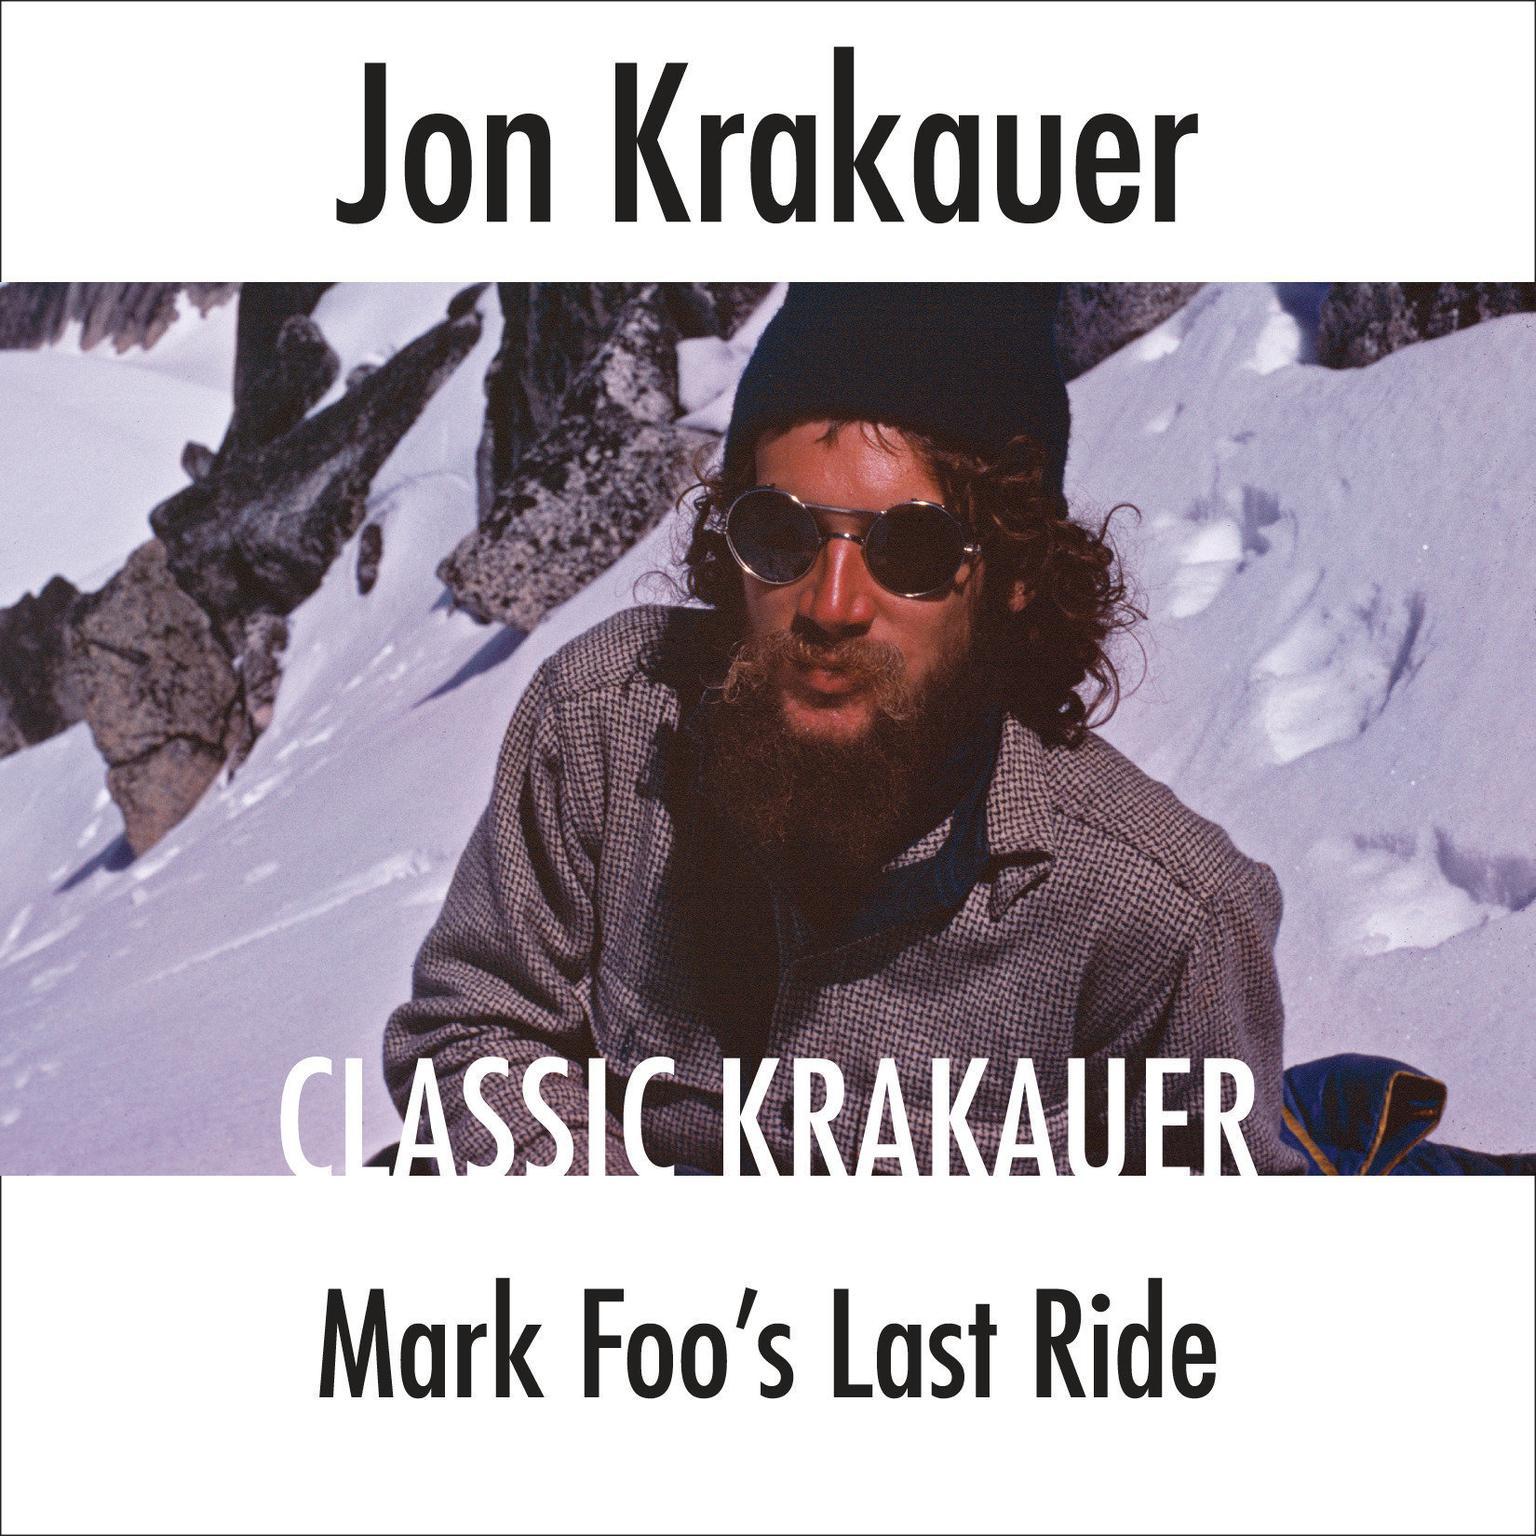 Mark Foos Last Ride Audiobook, by Jon Krakauer